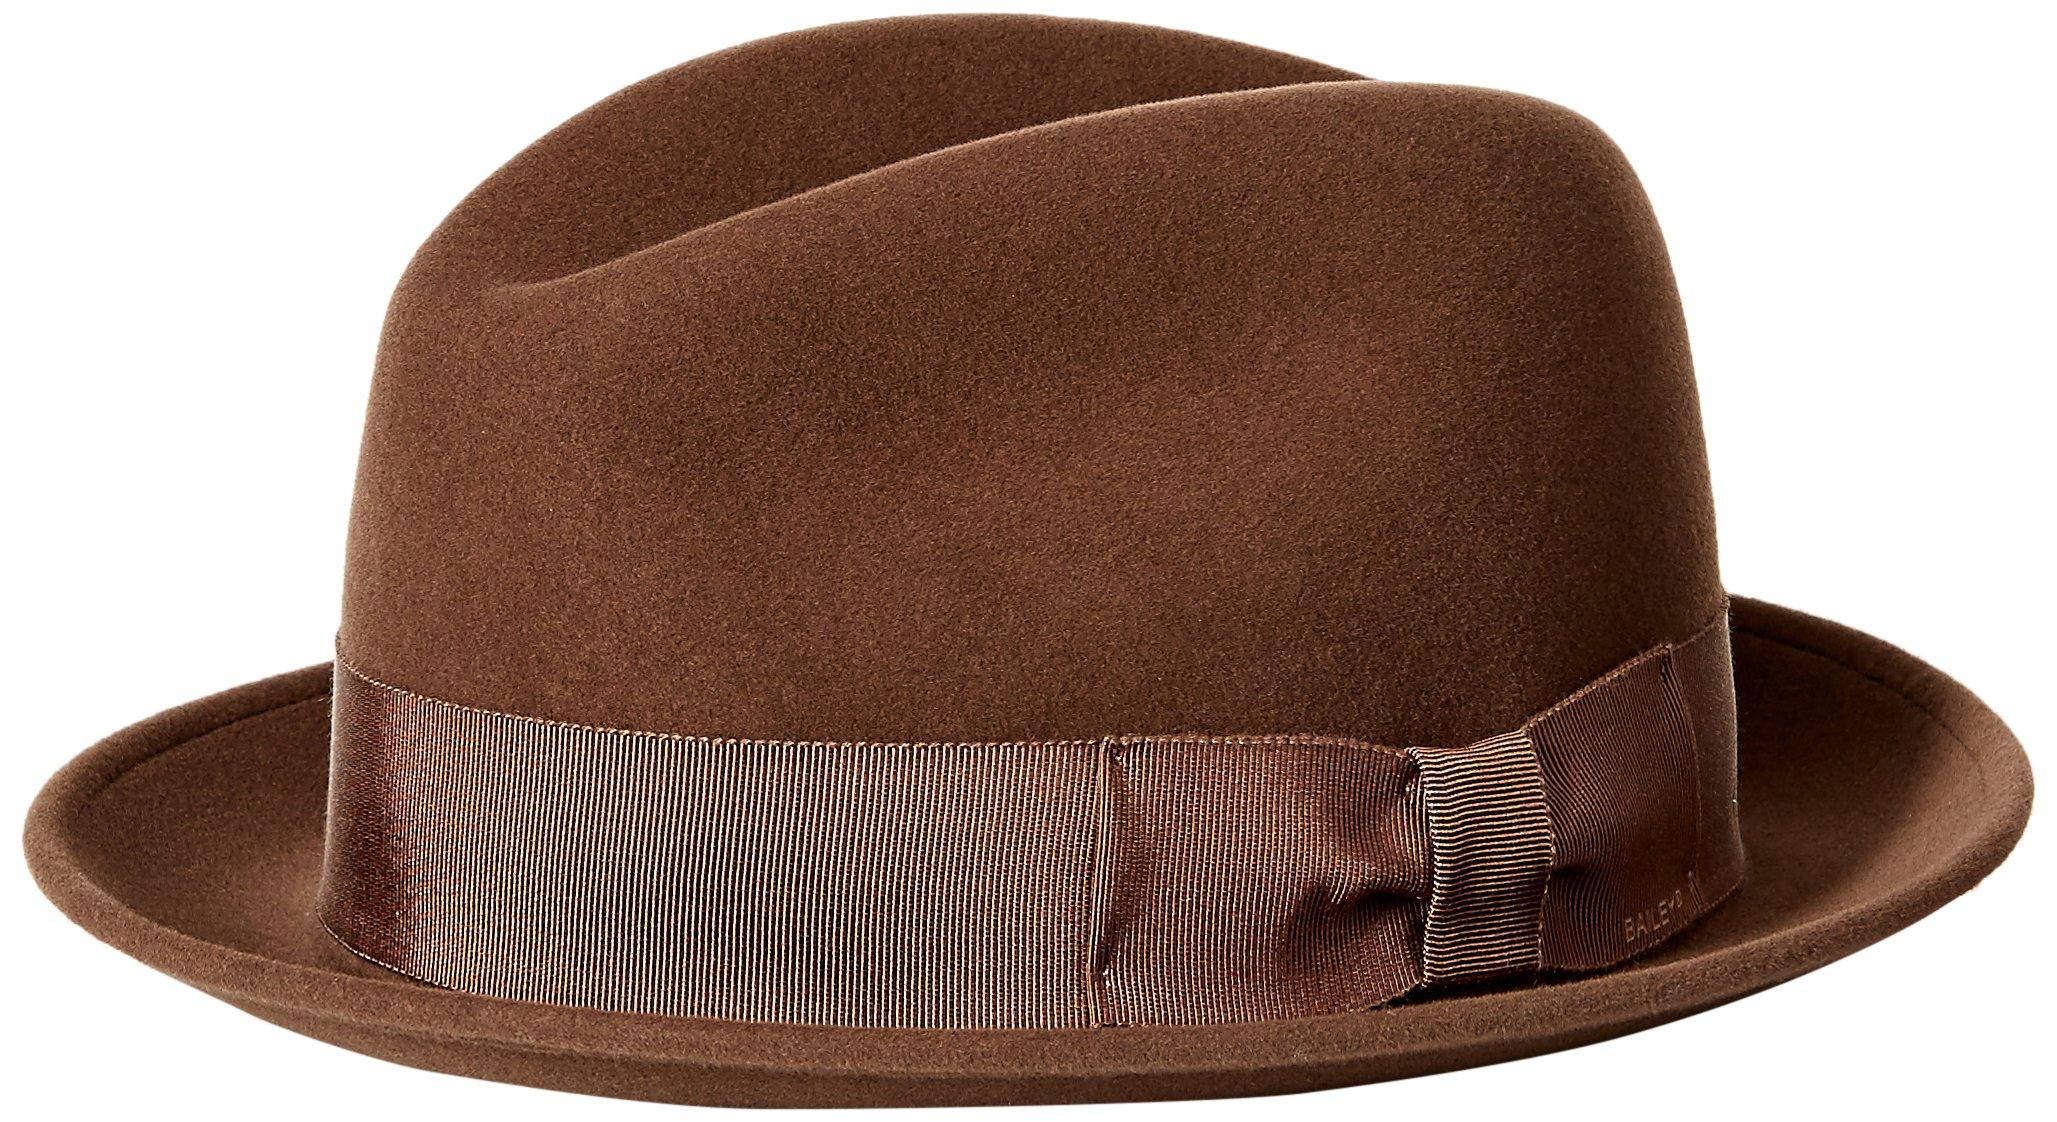 Bailey of Hollywood Men's Bogan Hat, Saddle, XL